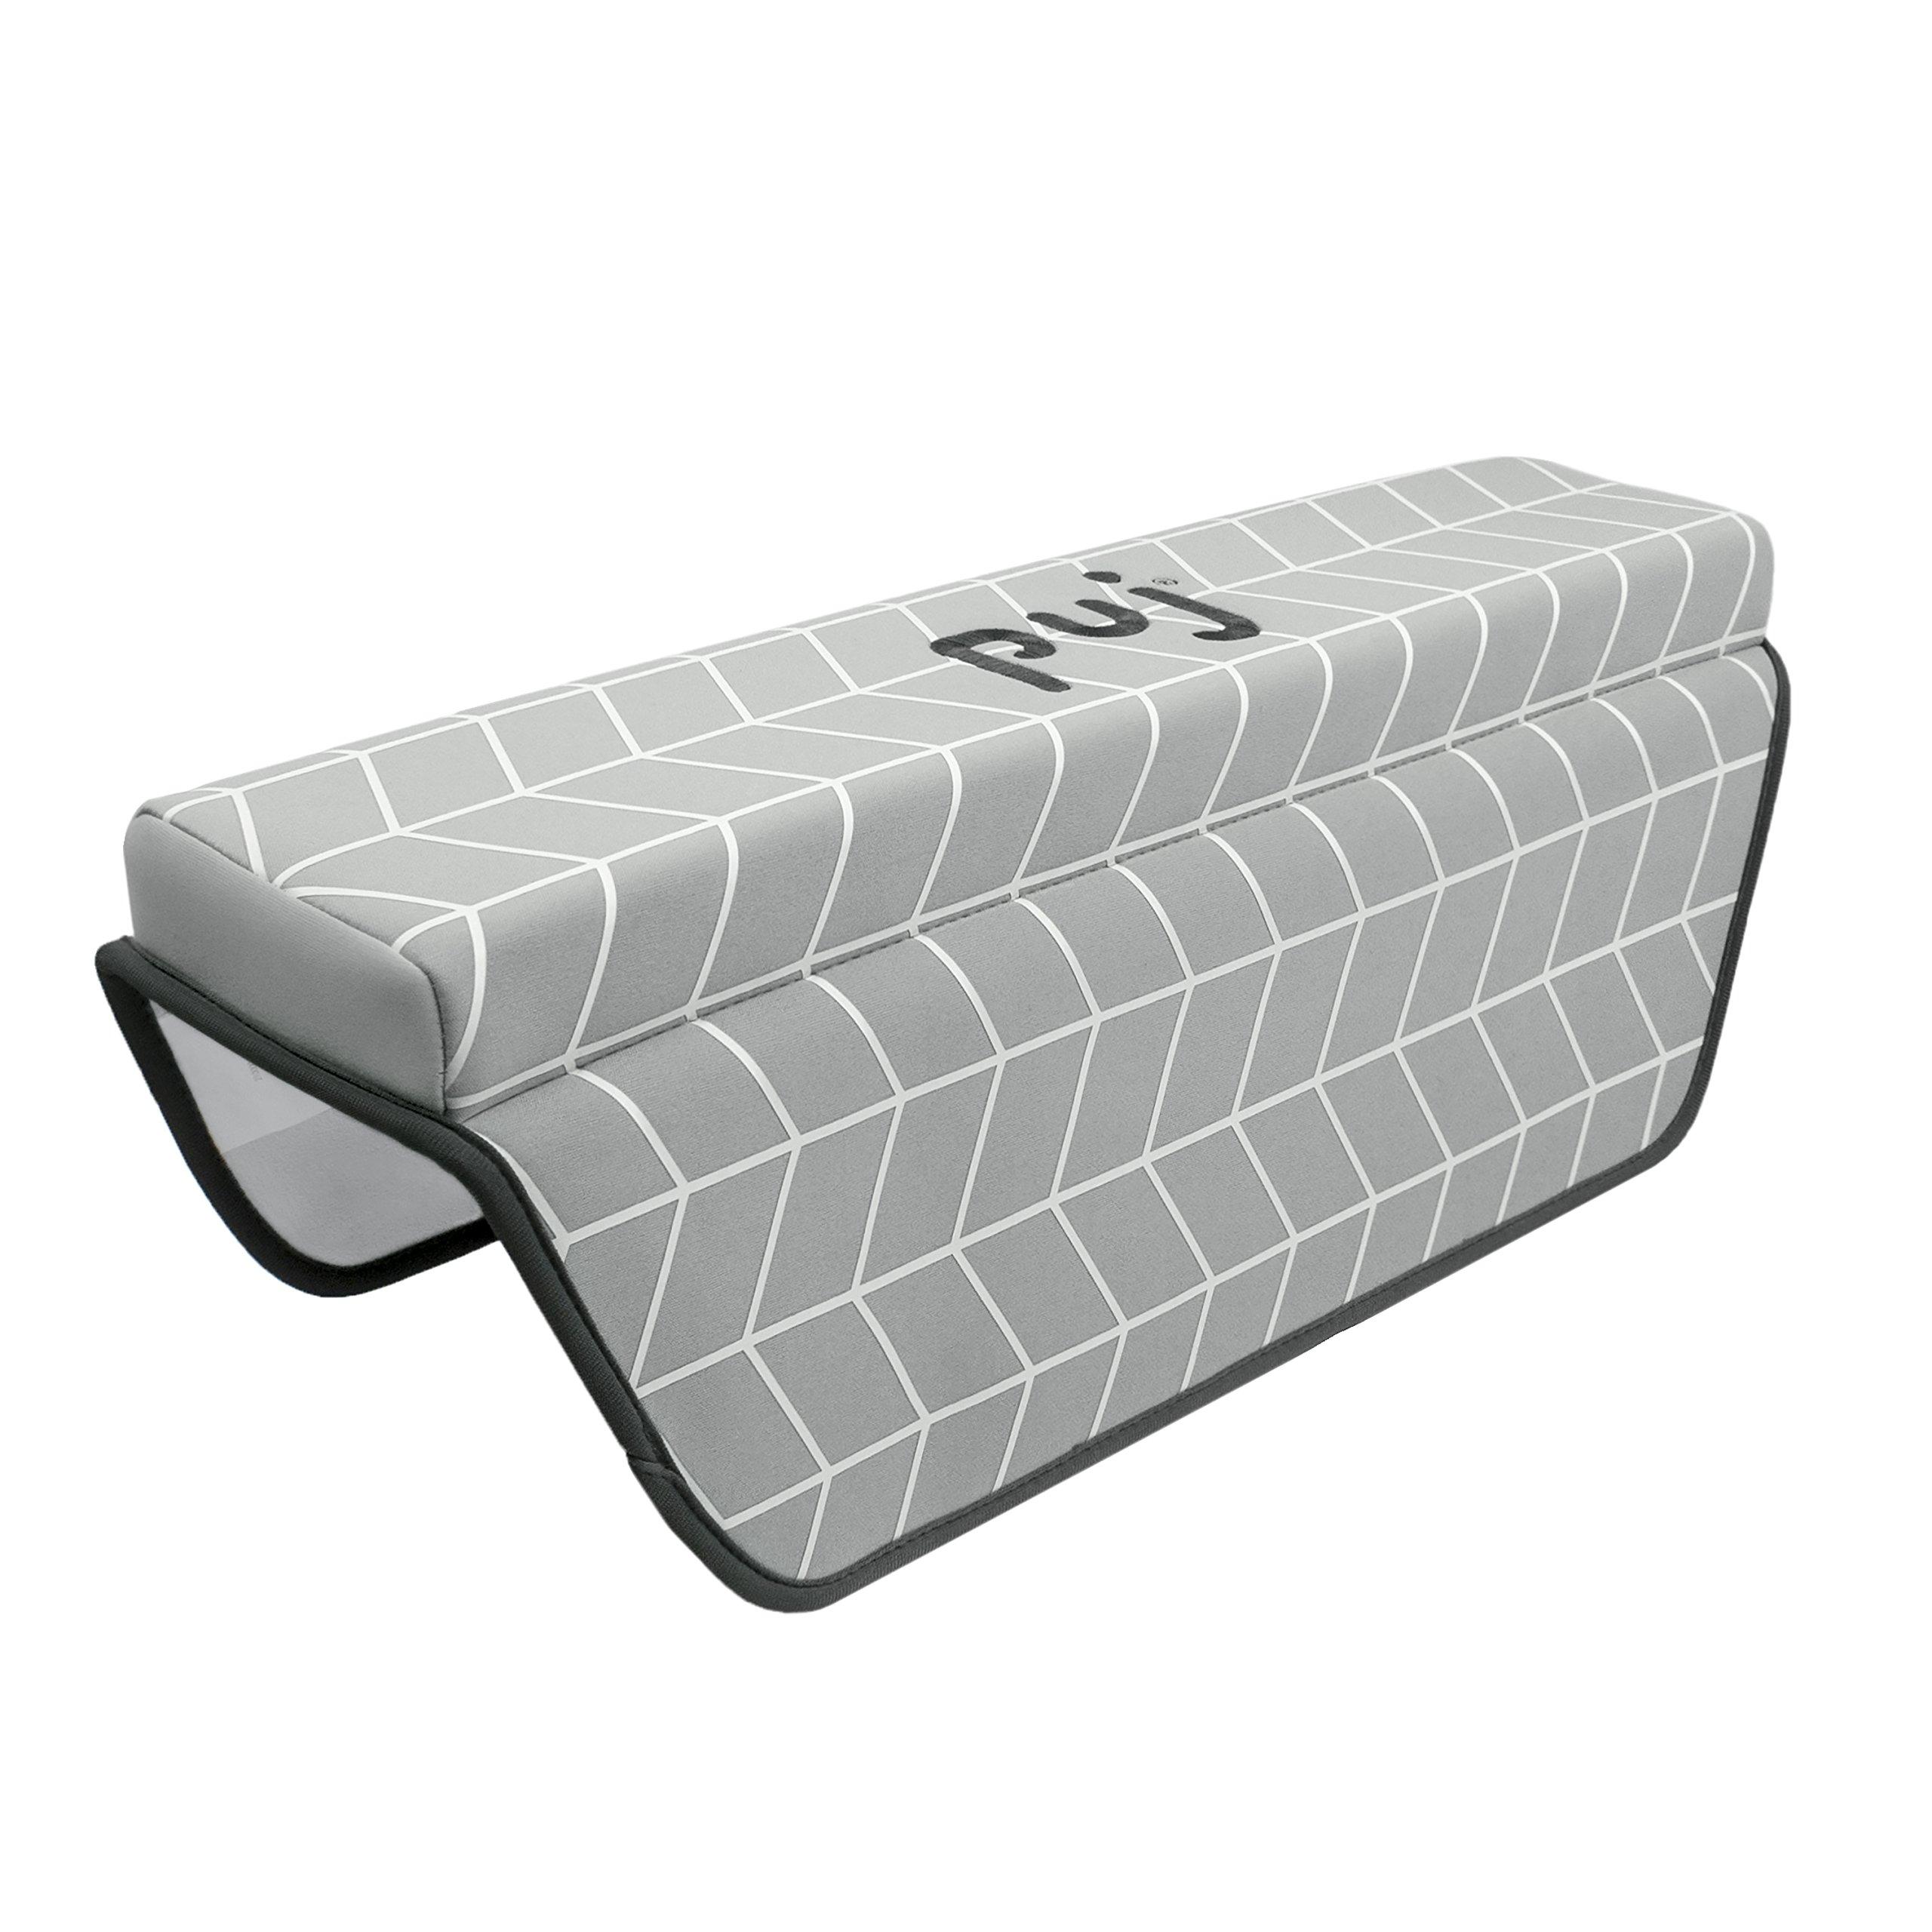 Amazon Com Puj Snug Ultra Soft Spout Cover White